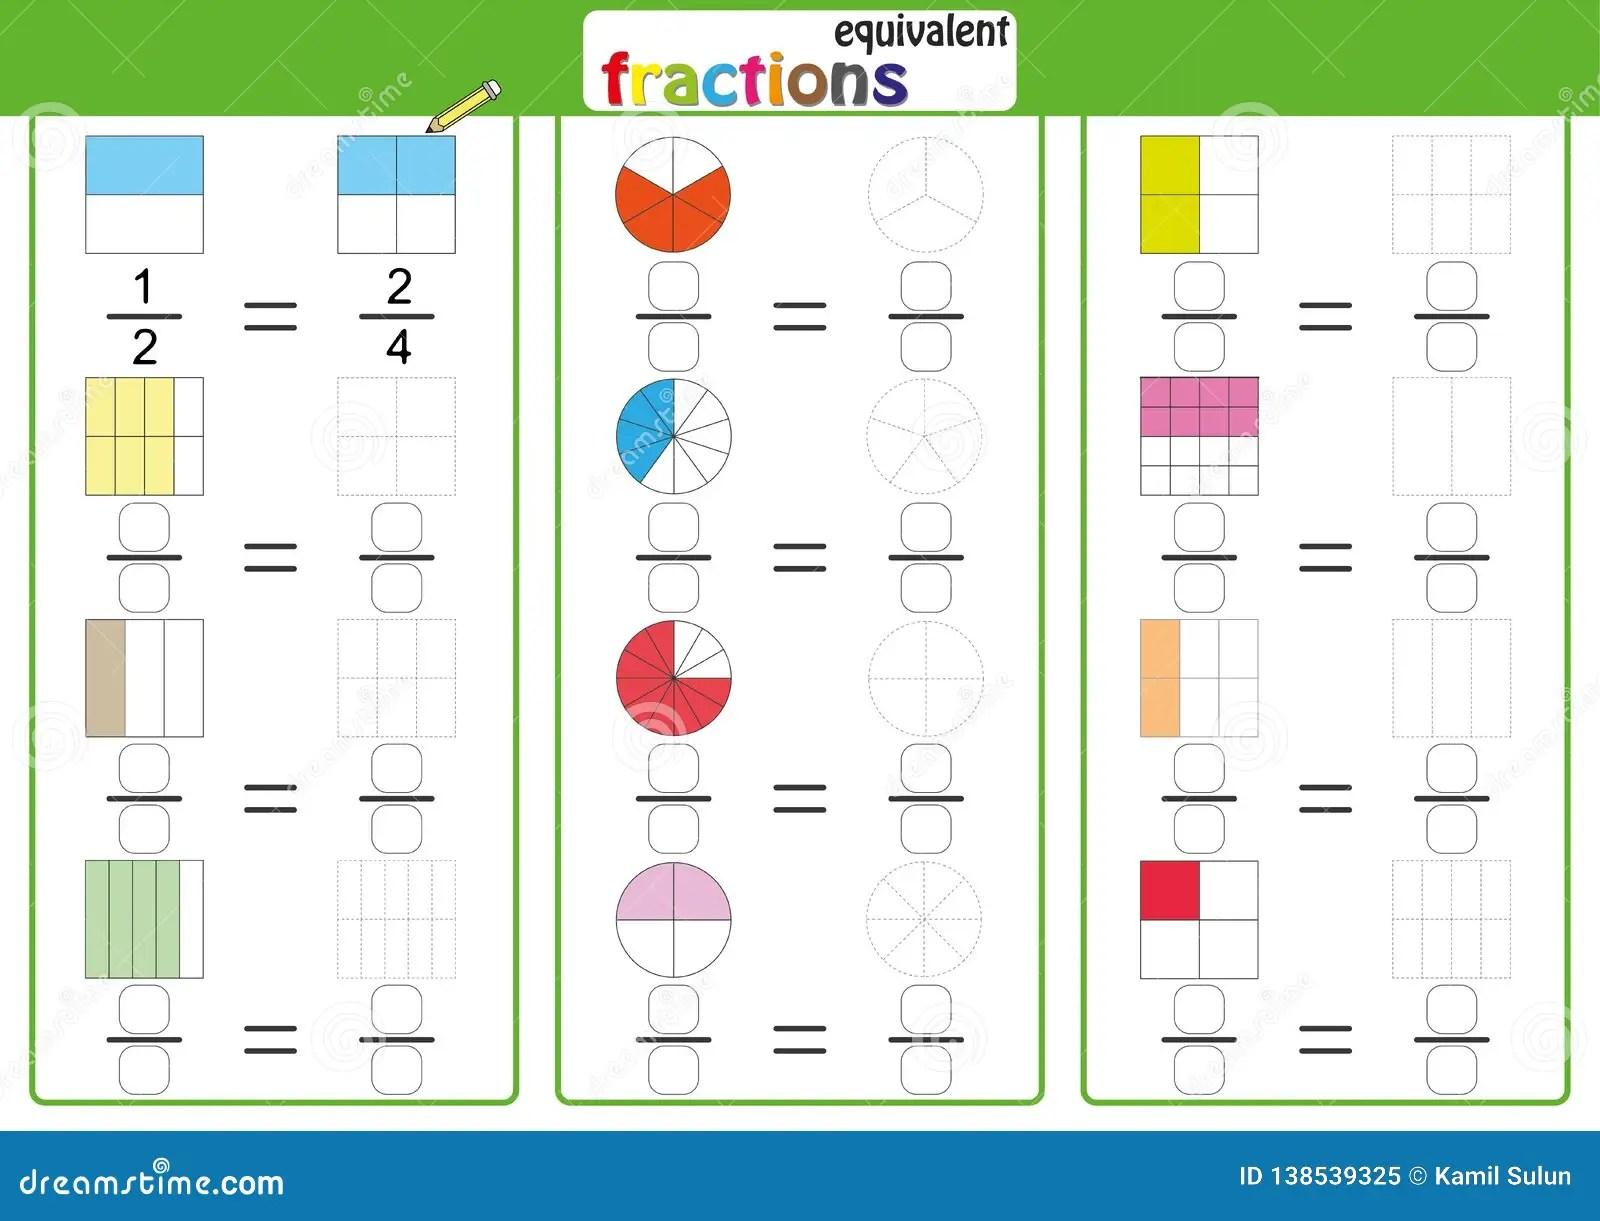 Equivalent Frantions Mathematics Math Worksheet Find